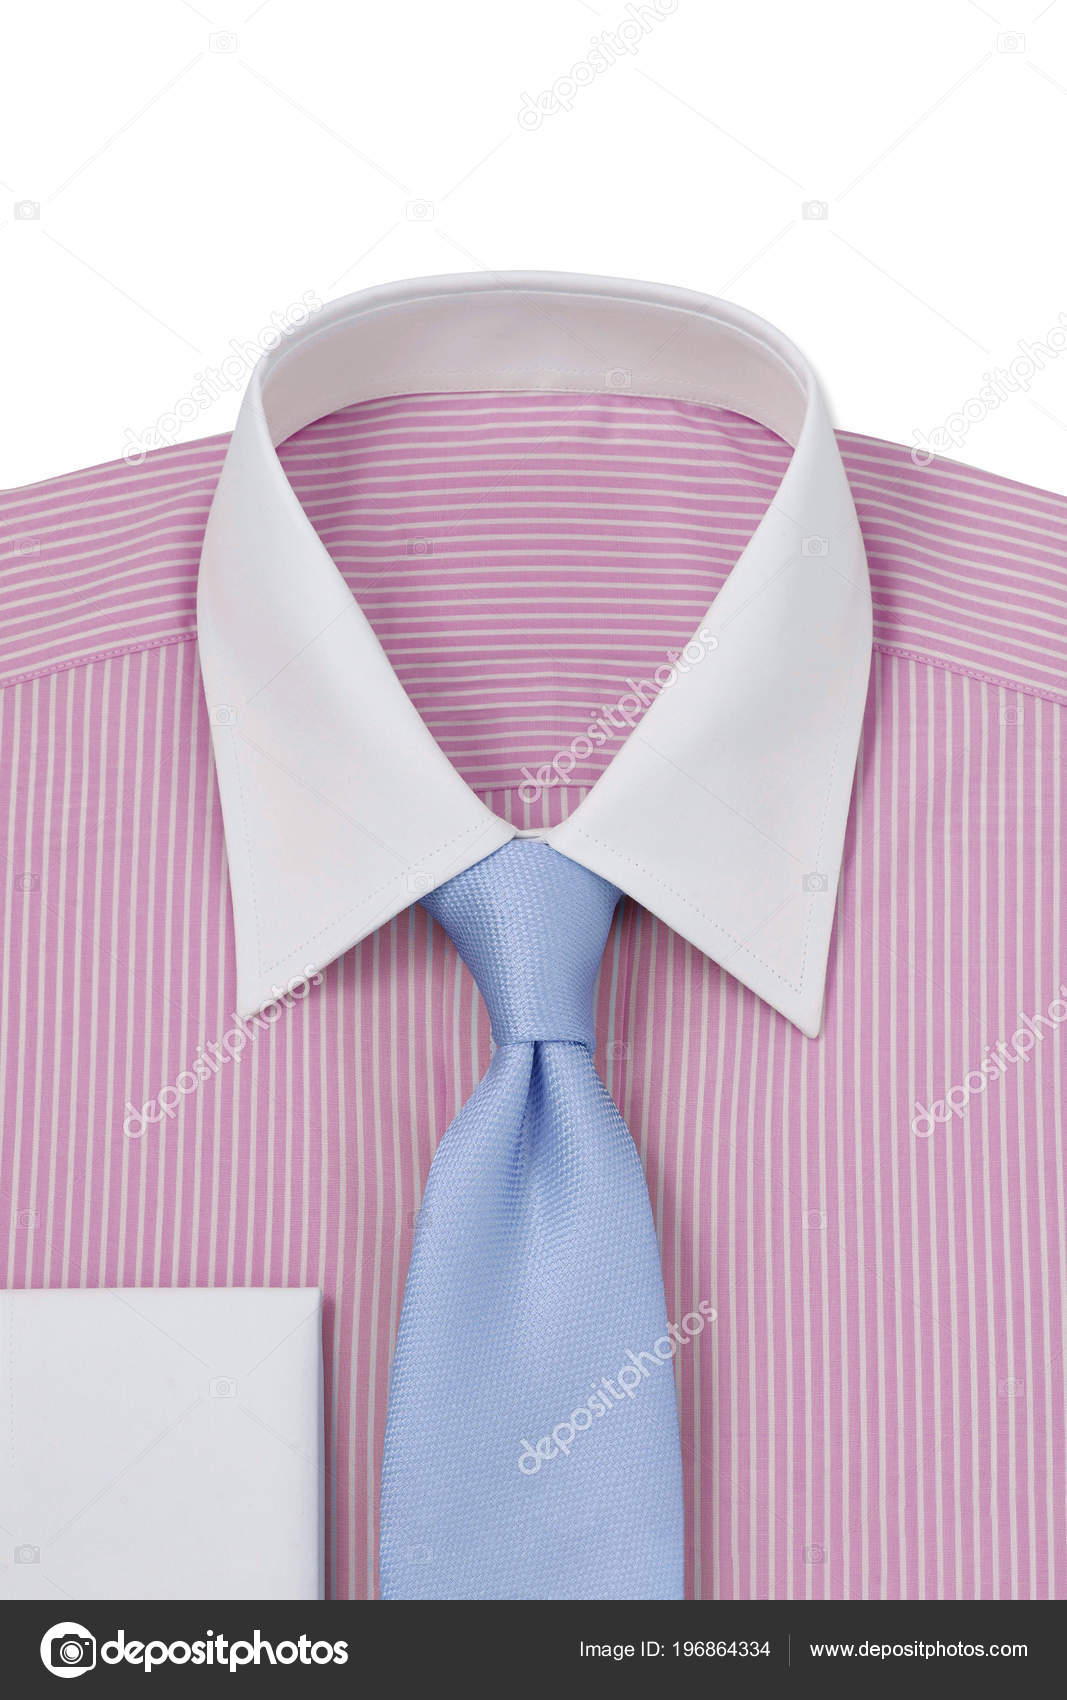 c03a39217271 Ένα Ροζ Ριγέ Λευκό Γιακά Και Μανσέτες Διπλωμένο Mens Φόρεμα– εικόνα αρχείου